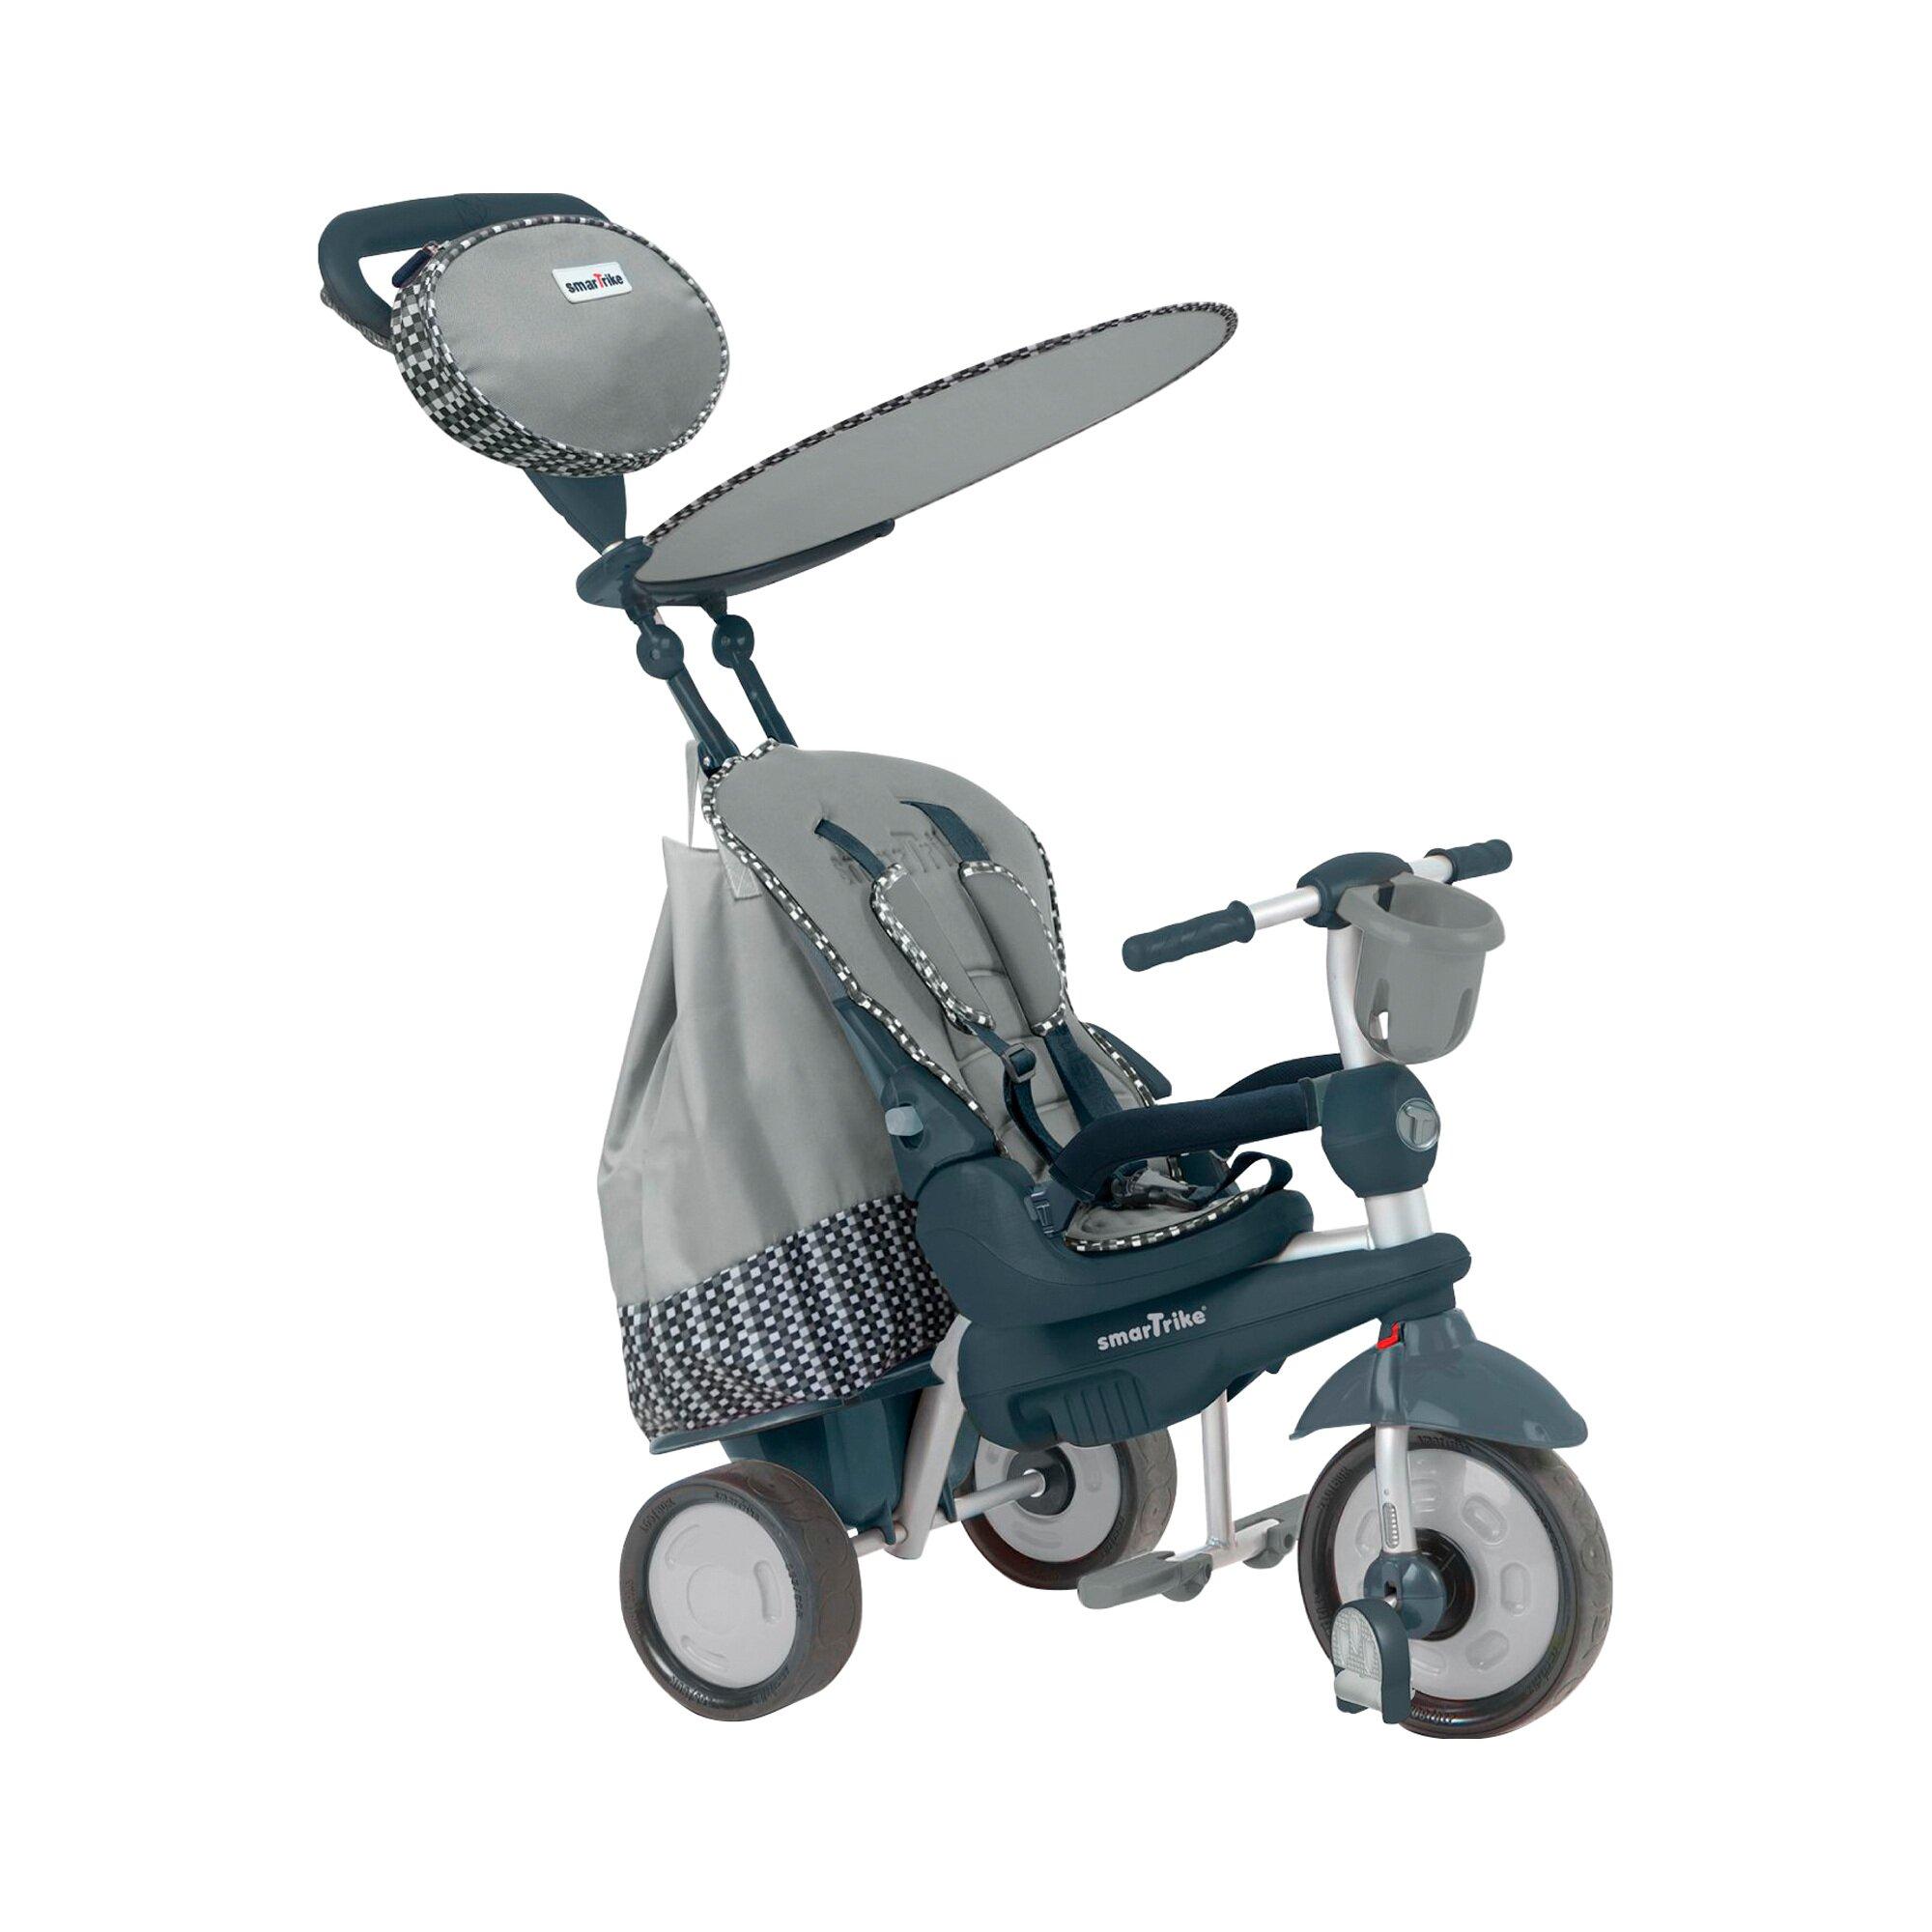 Smartrike Dreirad Splash 5 in 1 Baby Trike